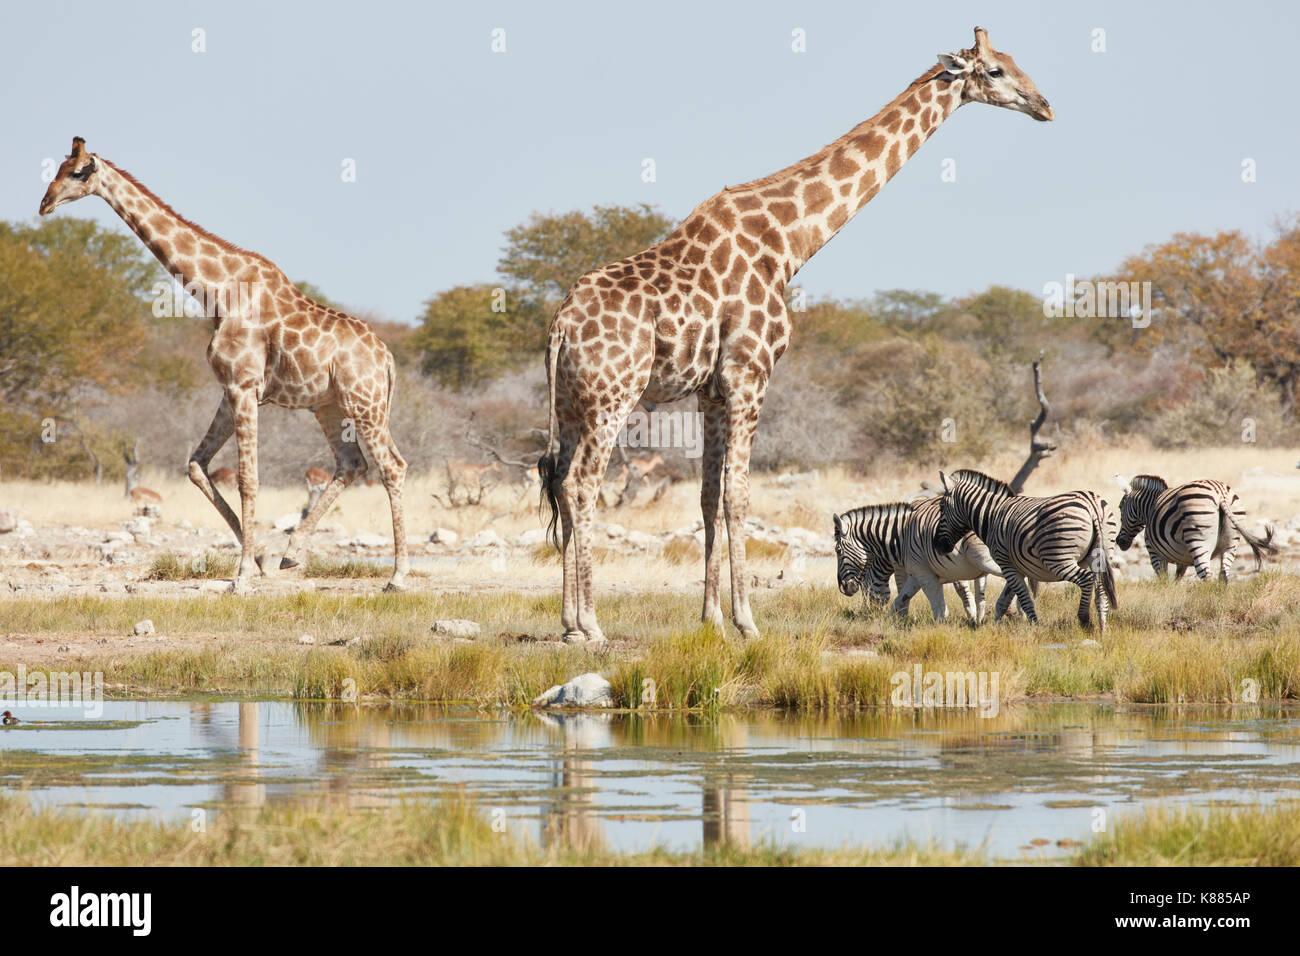 Water Hole Zebra And Giraffe Stock Photos Amp Water Hole